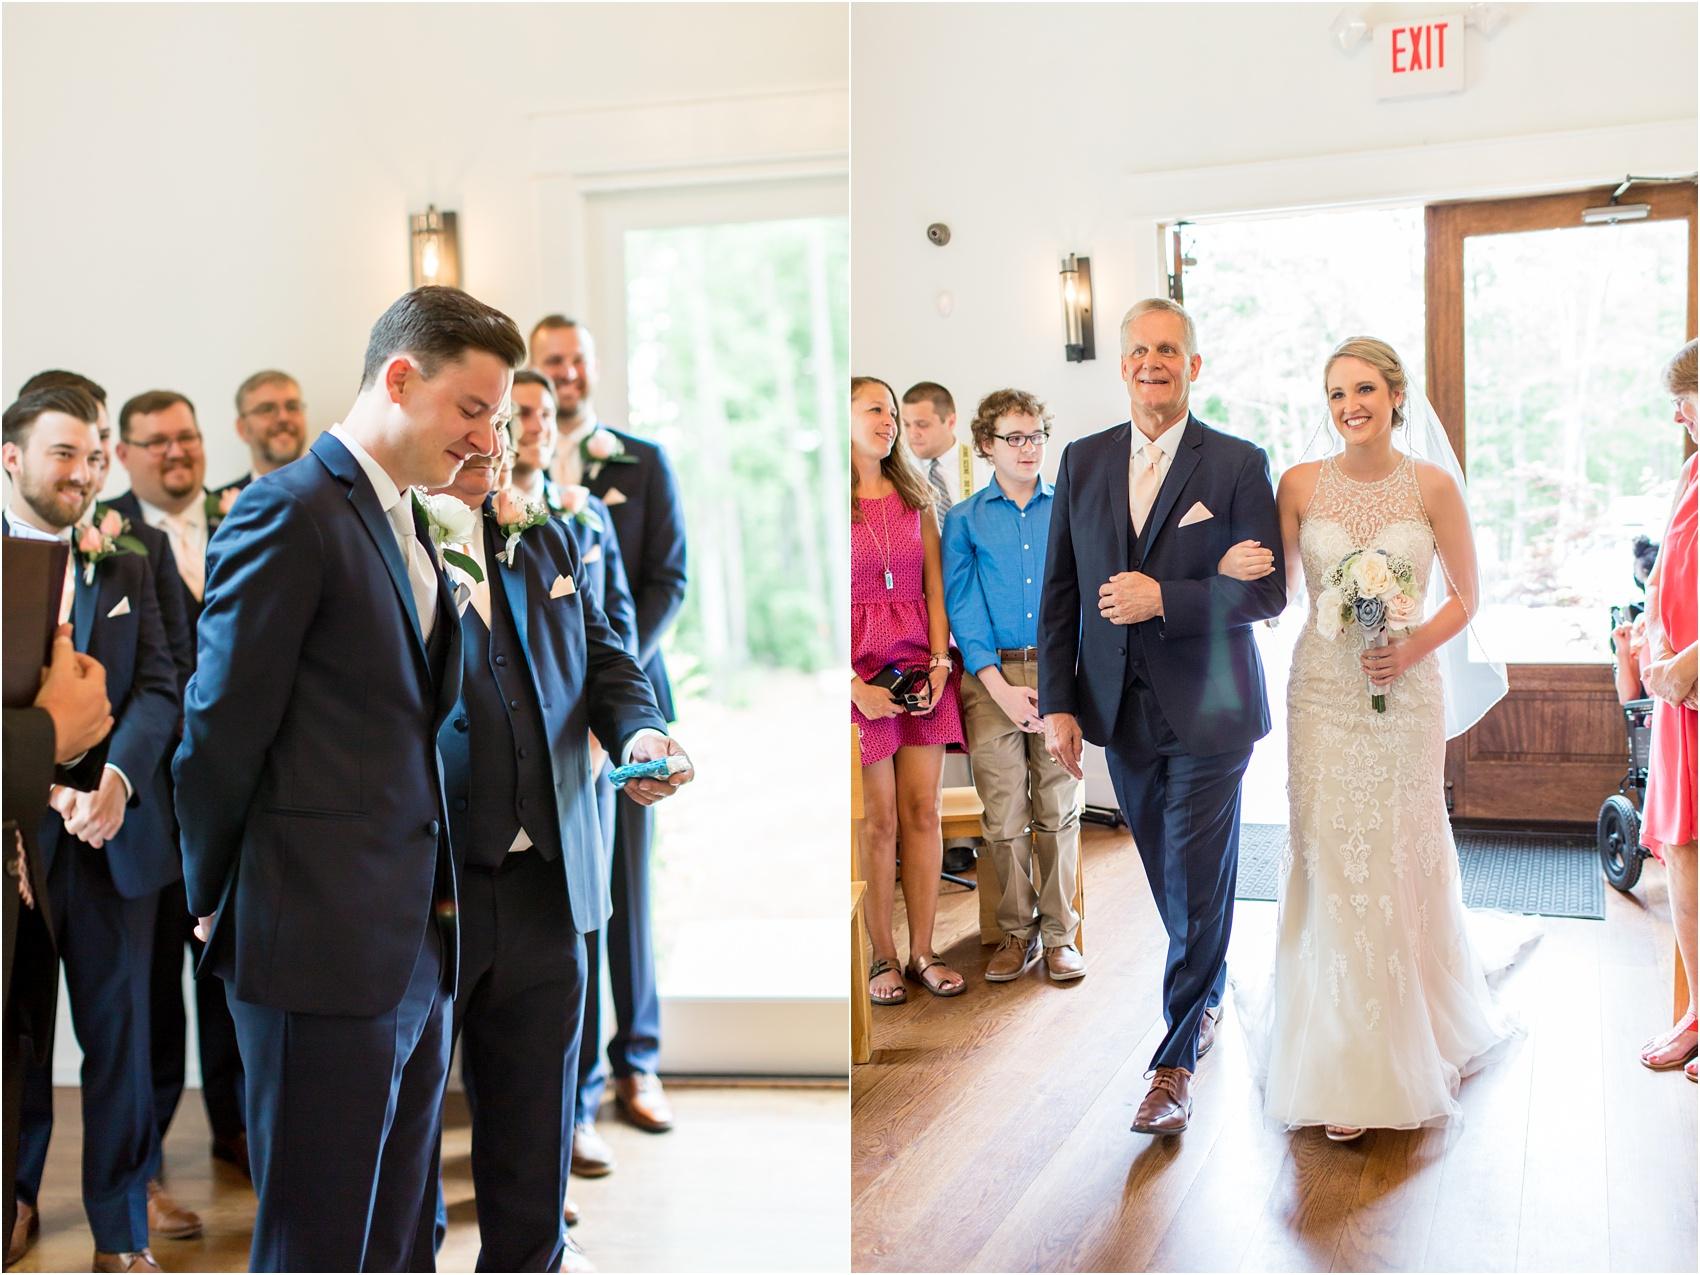 Savannah Eve Photography- Roper-Powell Wedding- Blog-24.jpg